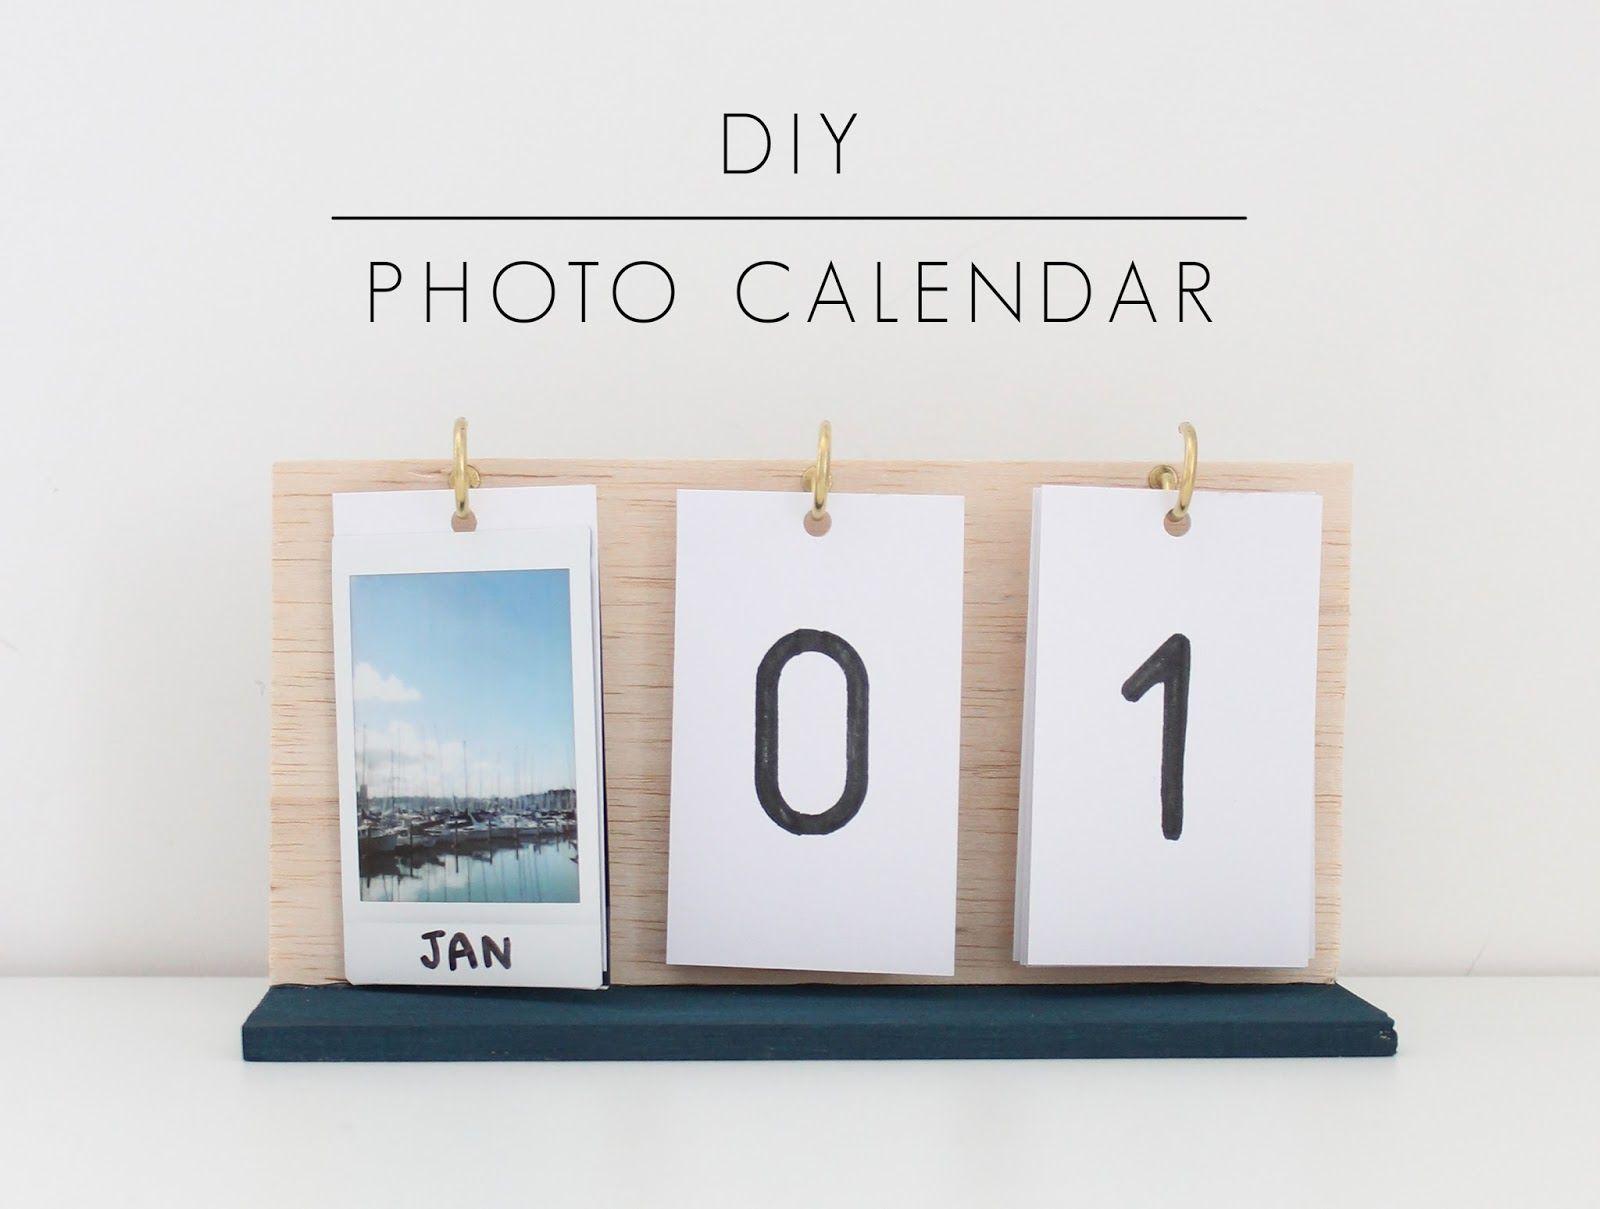 10 Fun Diy Gifts Http Www Hercampus School Inson Calendar Photo